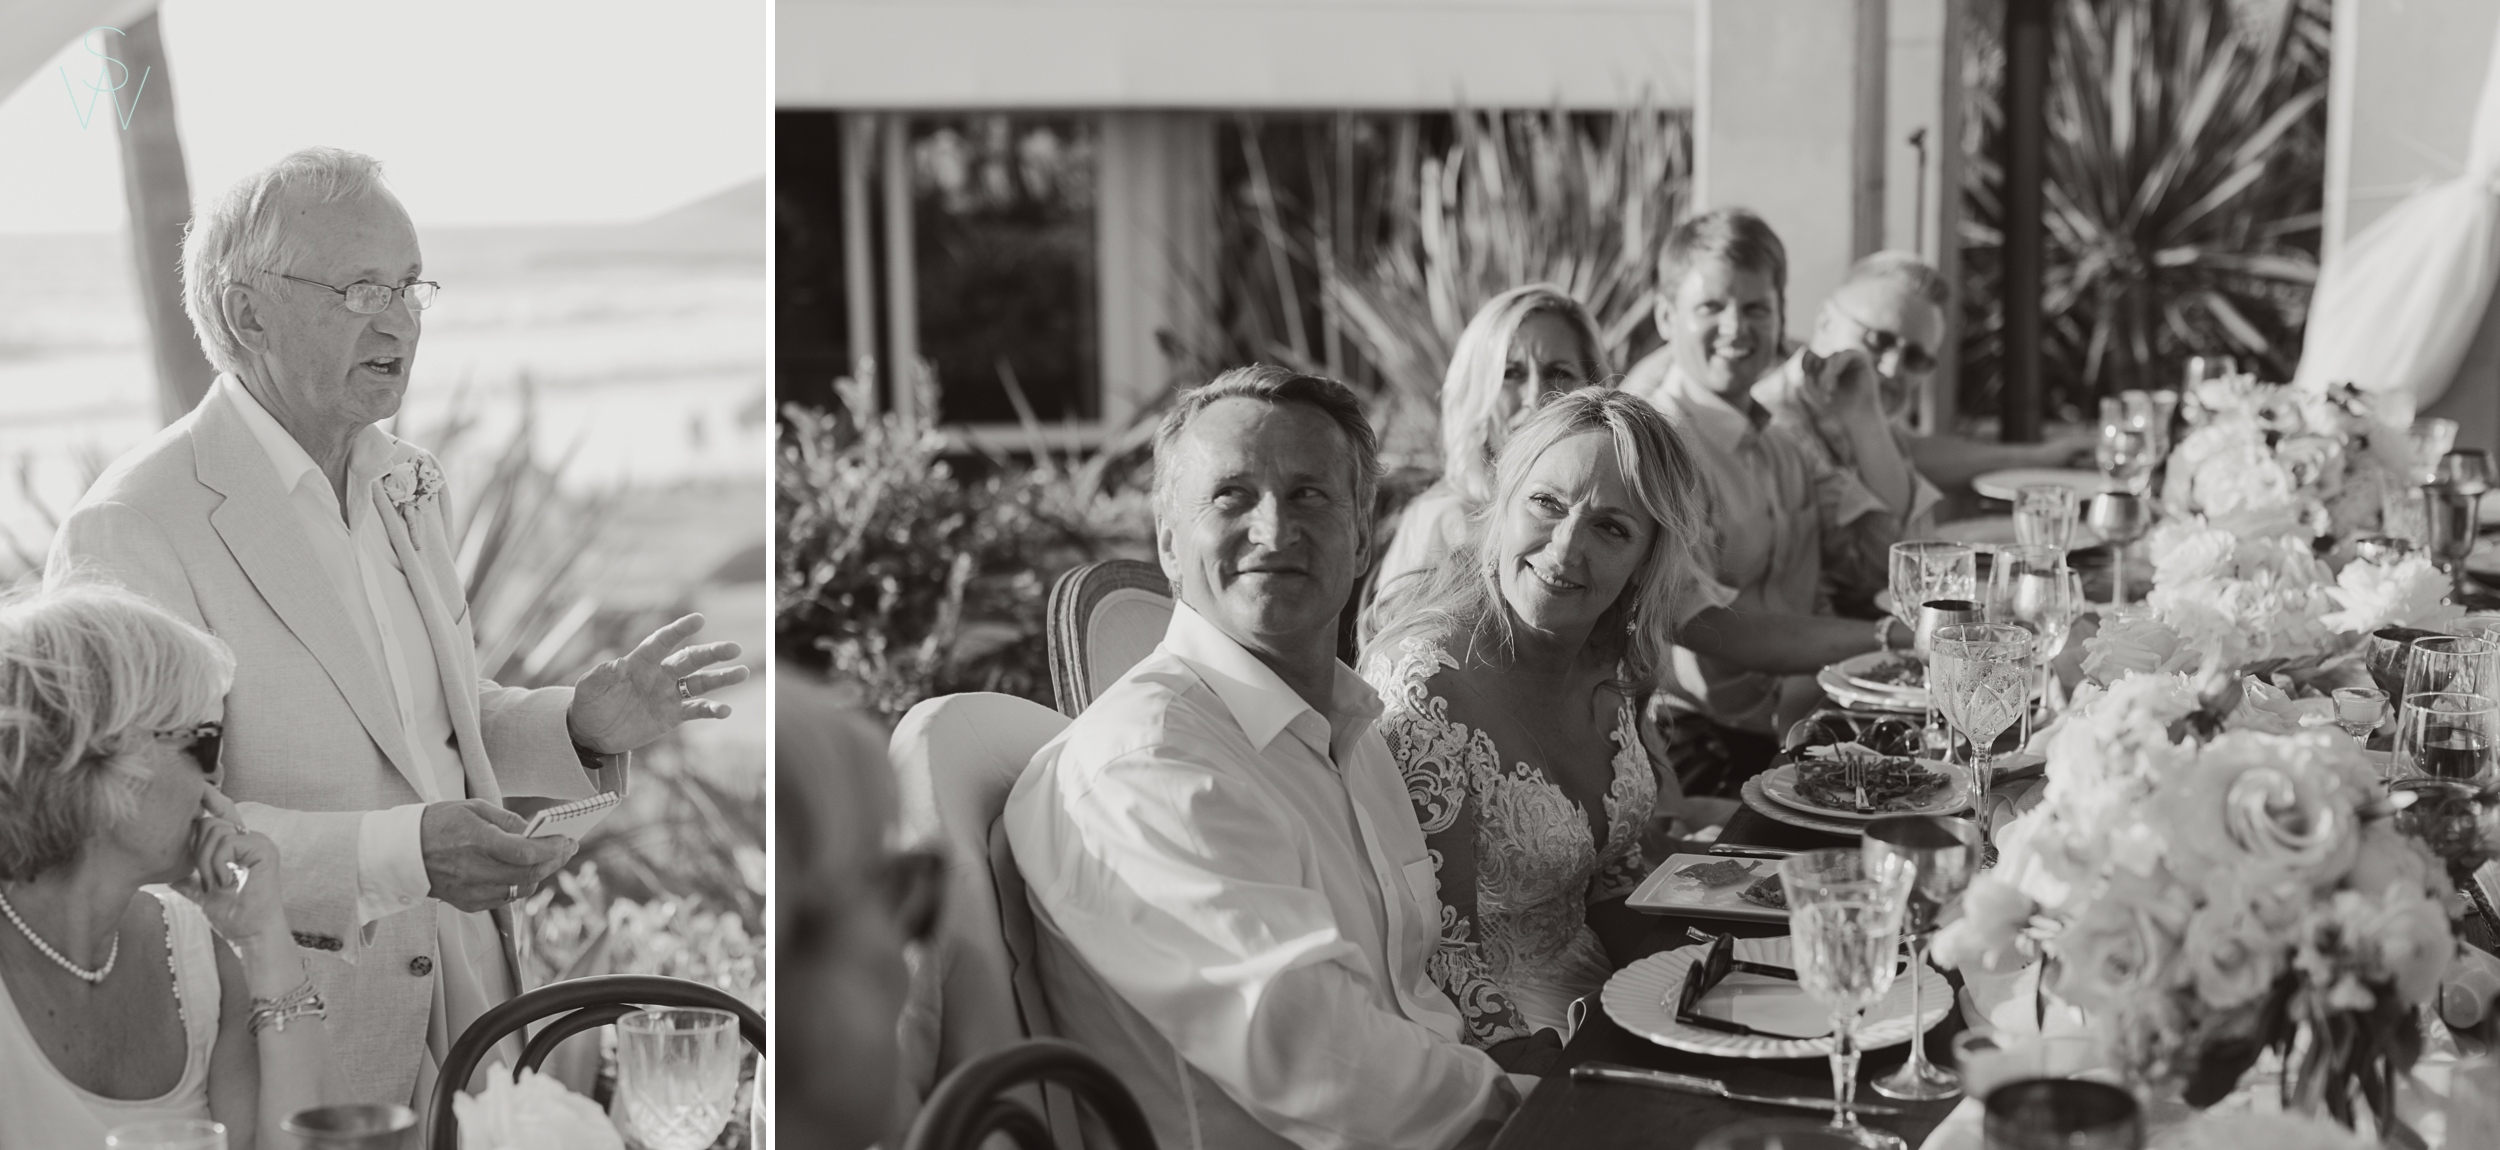 152DEL.MAR.WEDDINGS.Weddingspeech.photography.shewanders.JPG